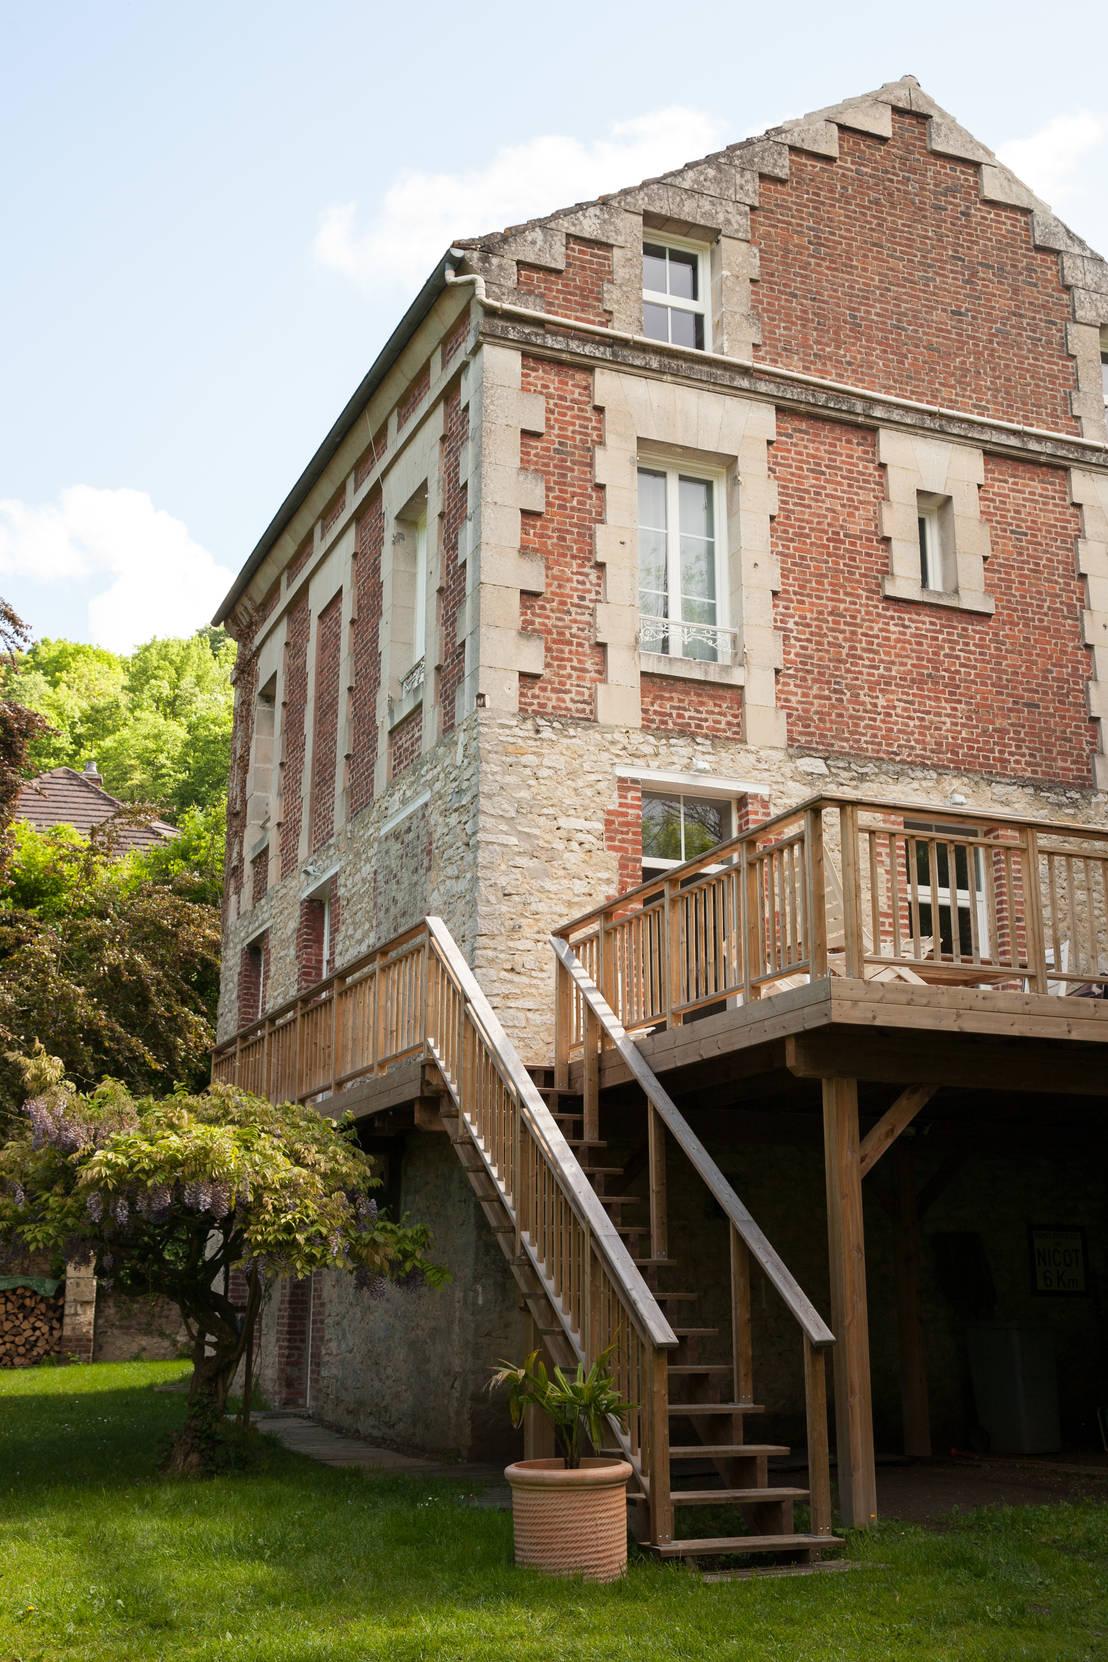 De perfecte balans tussen oud en modern - Oud en modern huis ...